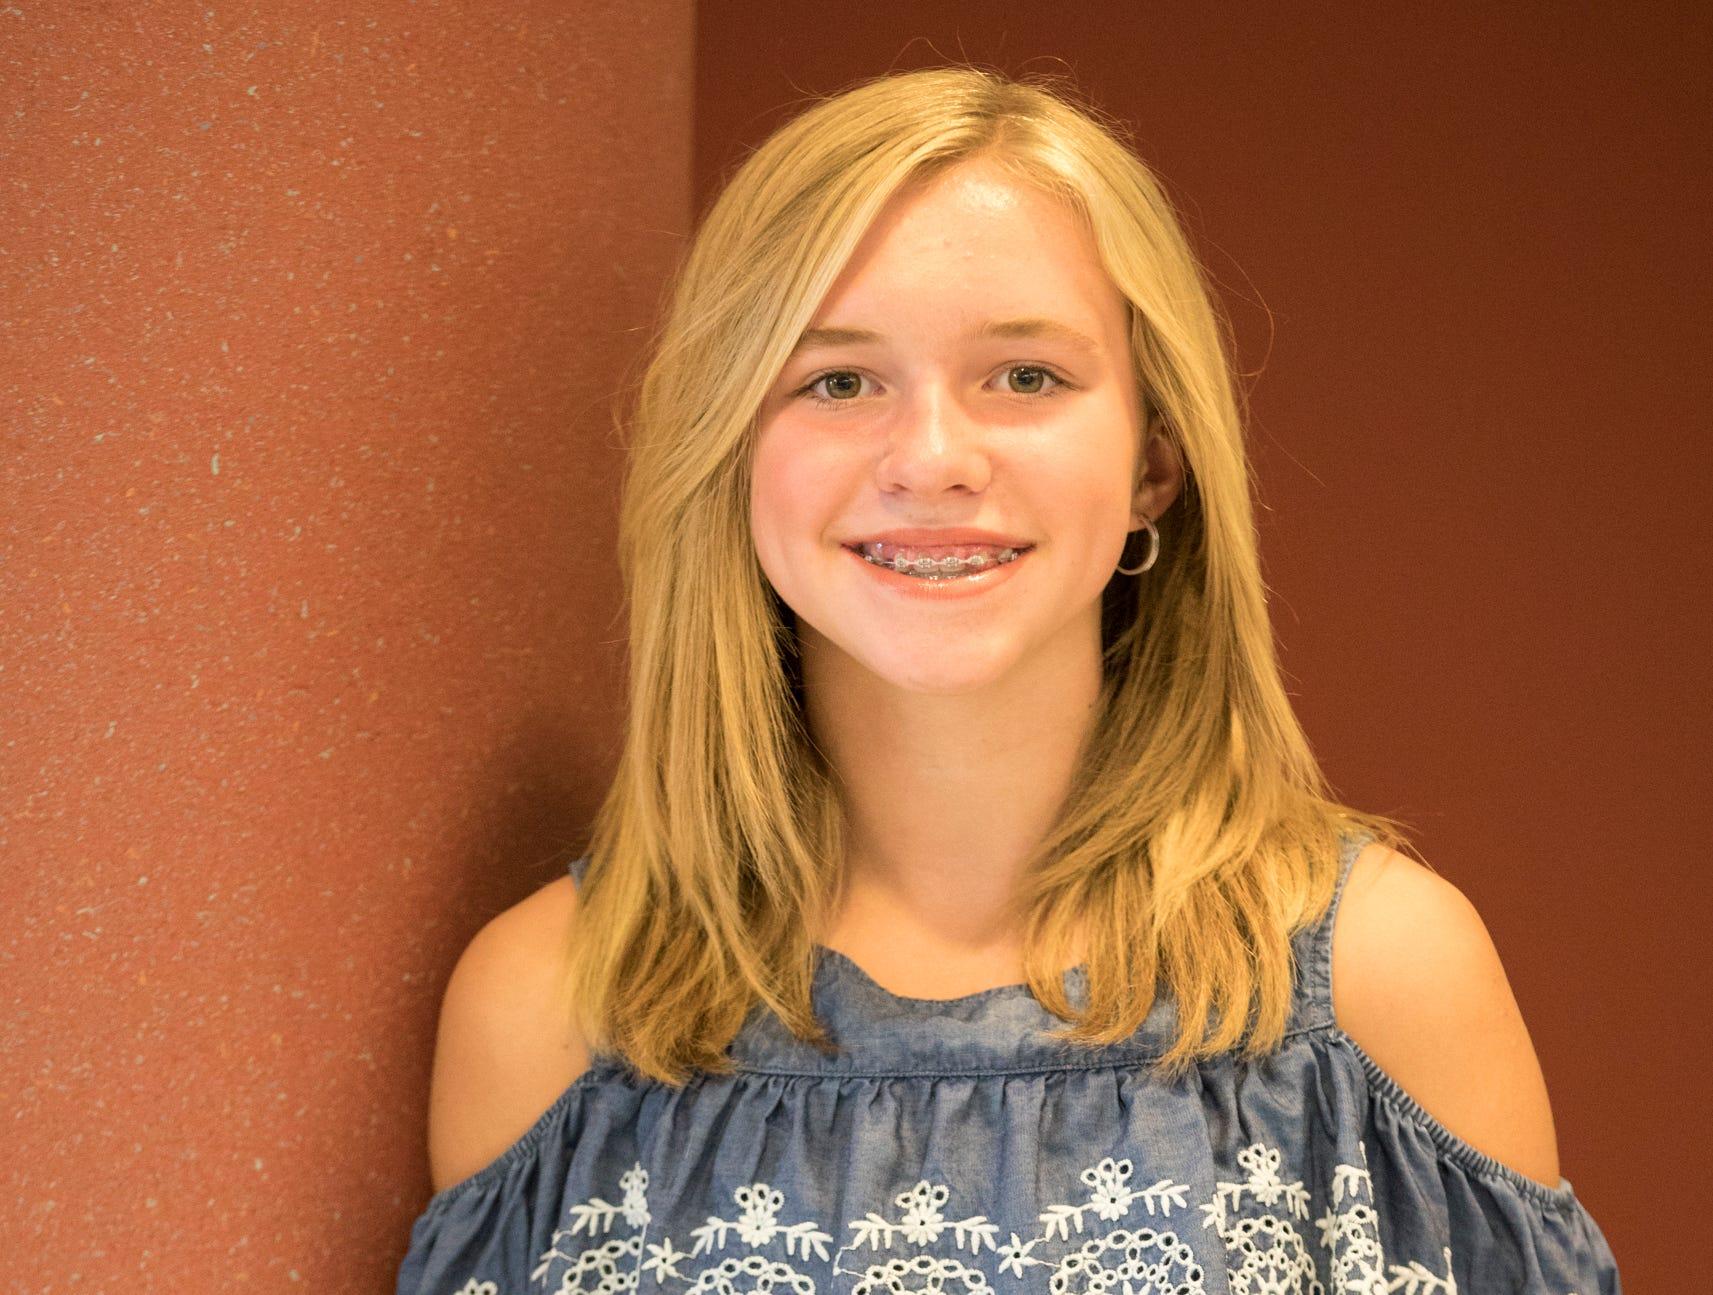 Chloe Wills, 12, Jefferson Livestock. Project: Beginner Fishing